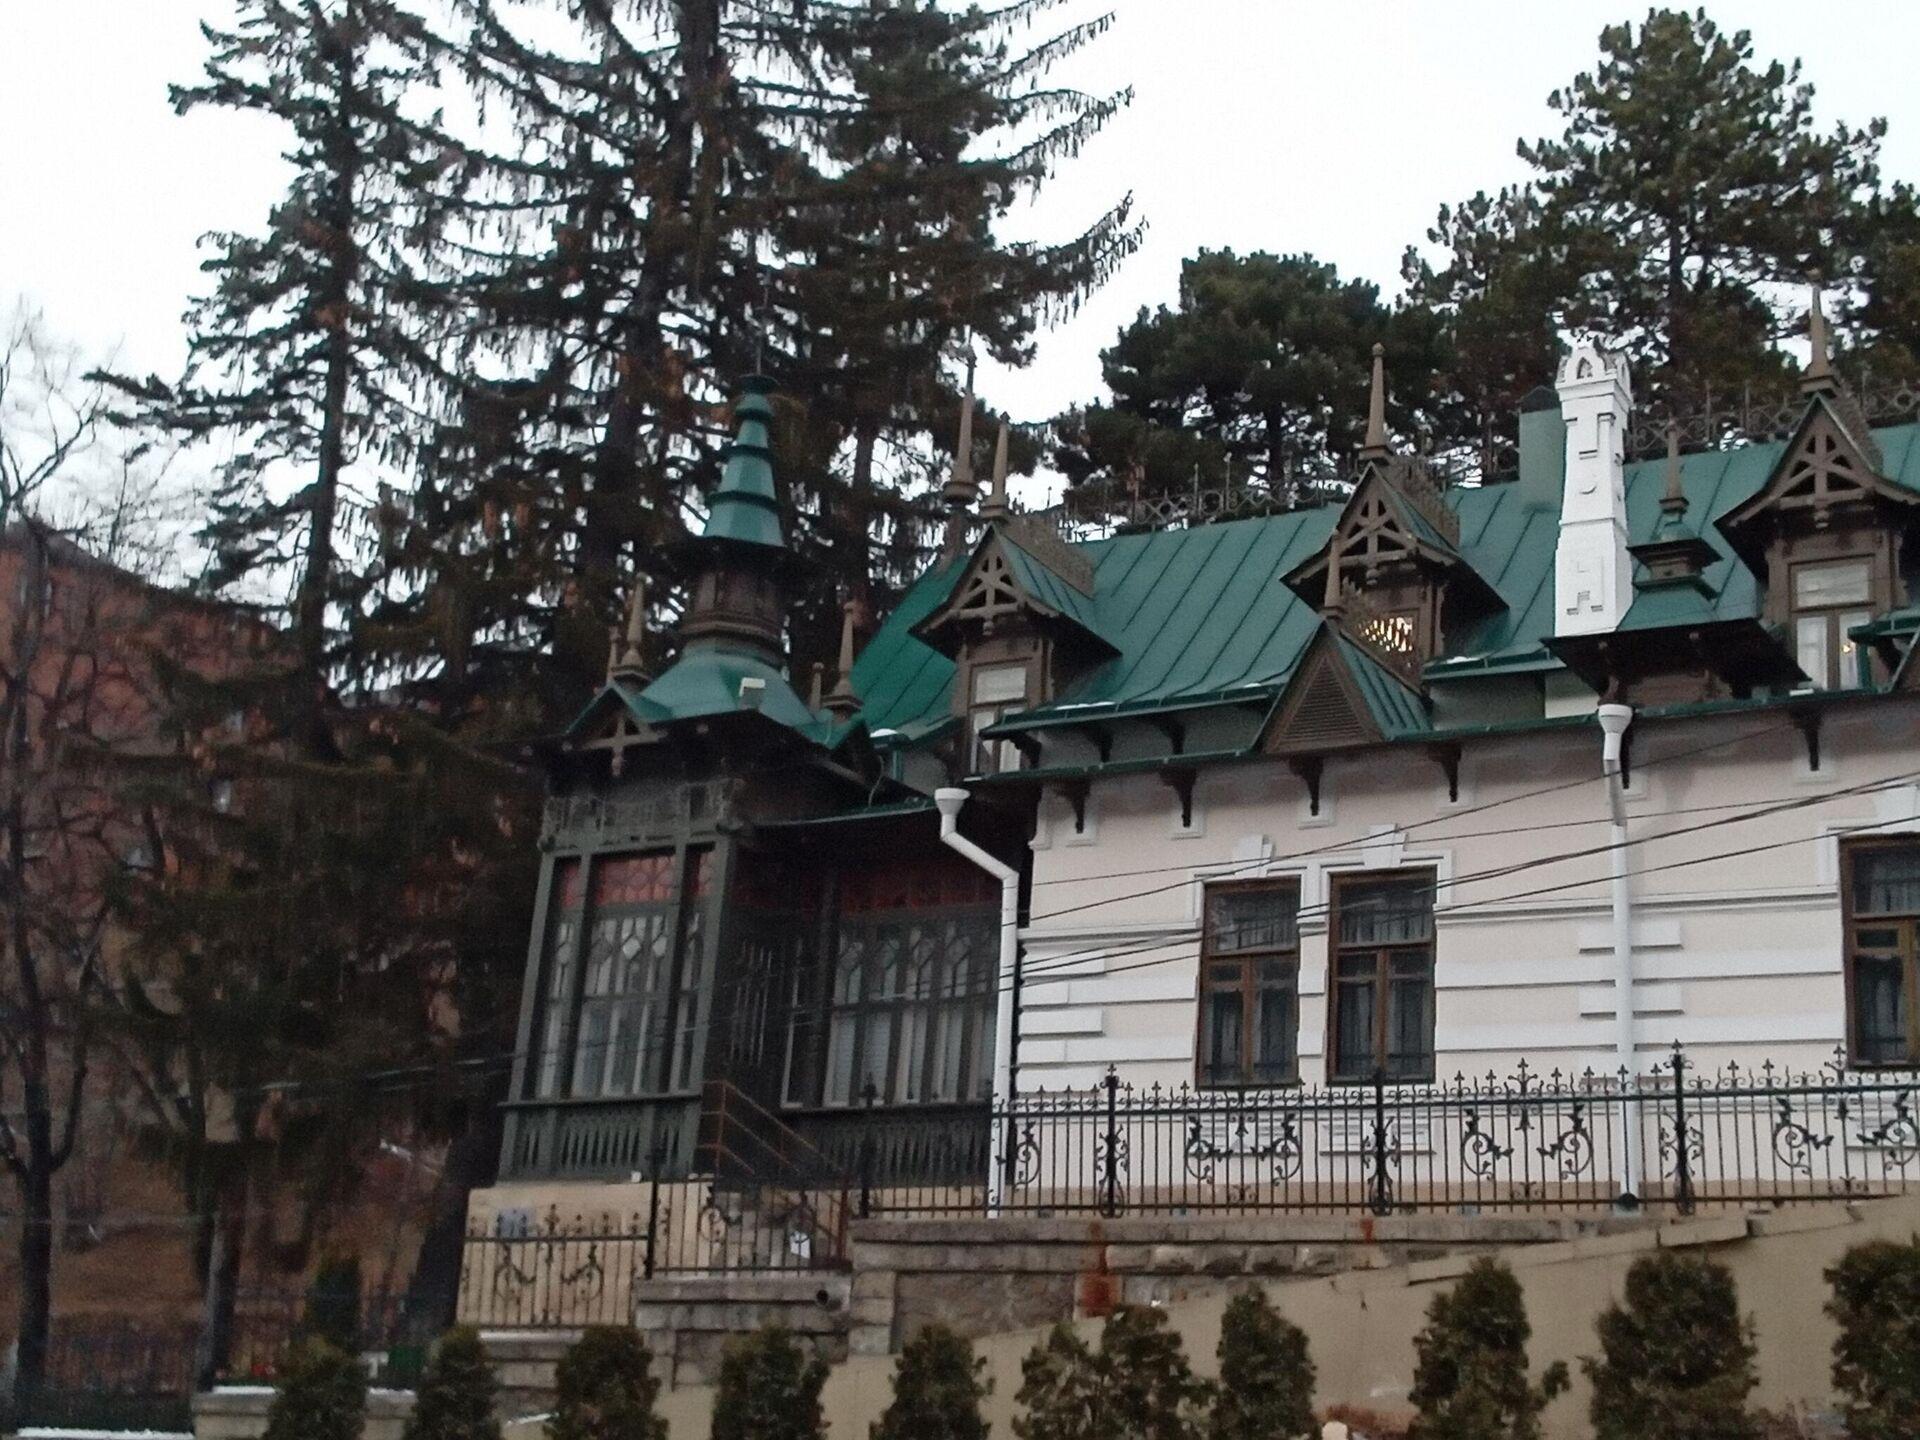 Дача Шаляпина - РИА Новости, 1920, 02.04.2021